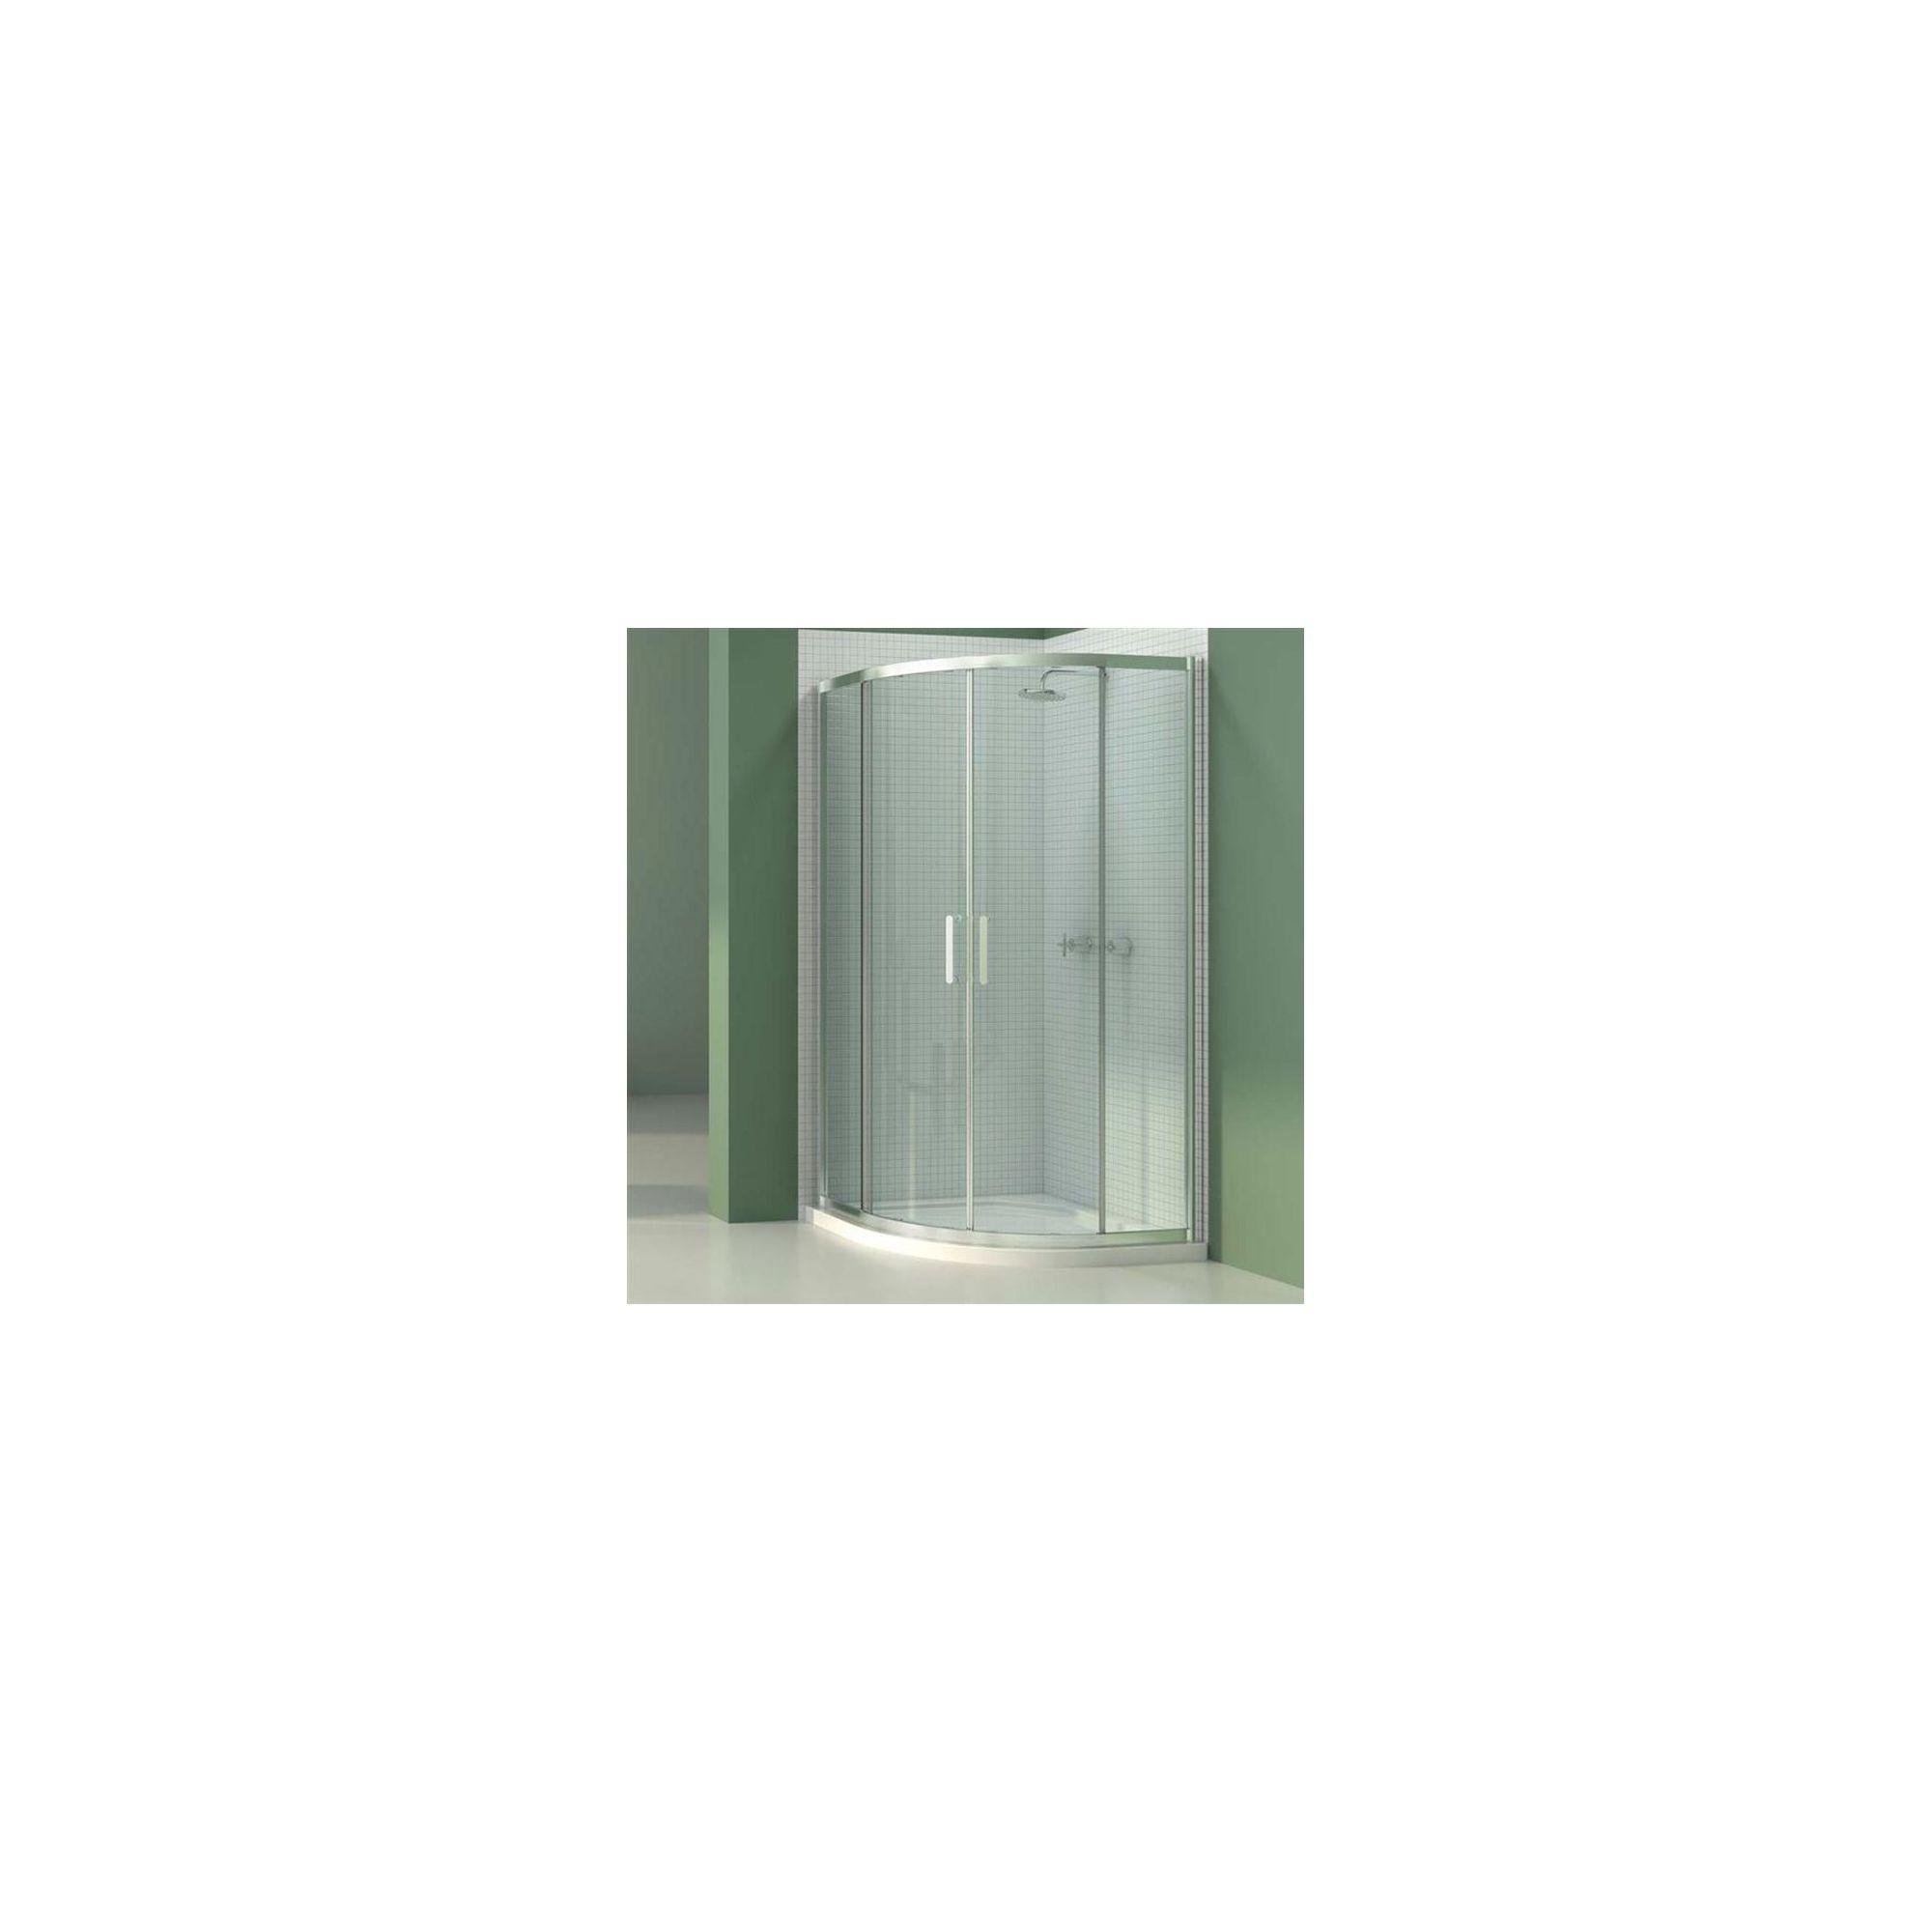 Merlyn Vivid Six Quadrant Shower Door, 800mm x 800mm, 6mm Glass at Tescos Direct